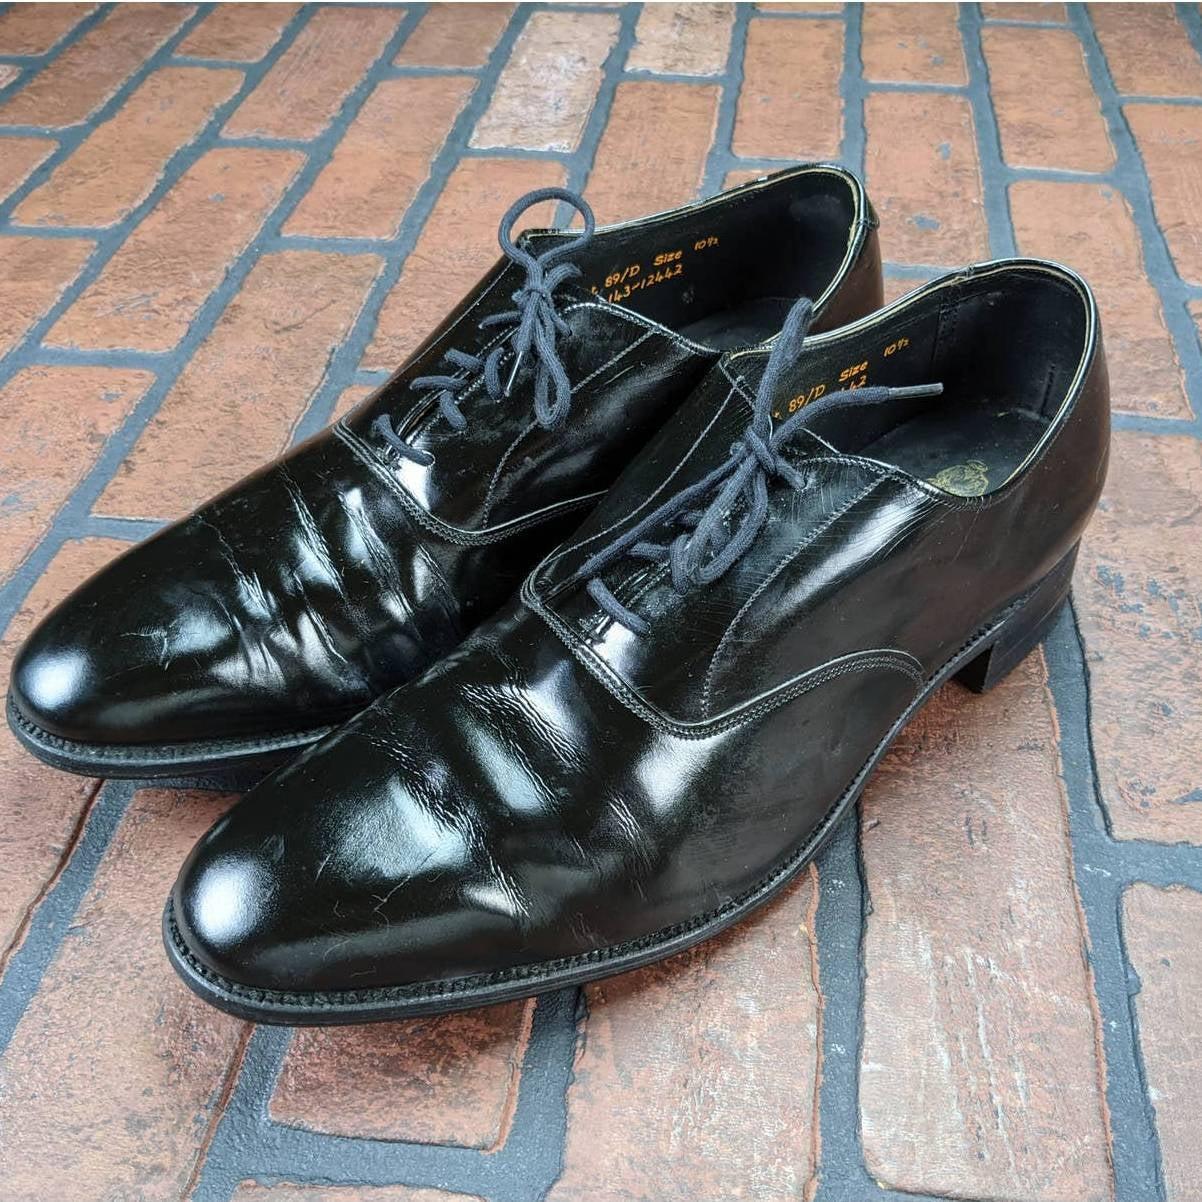 Paul Stewart 10.5 Shoes England Bench